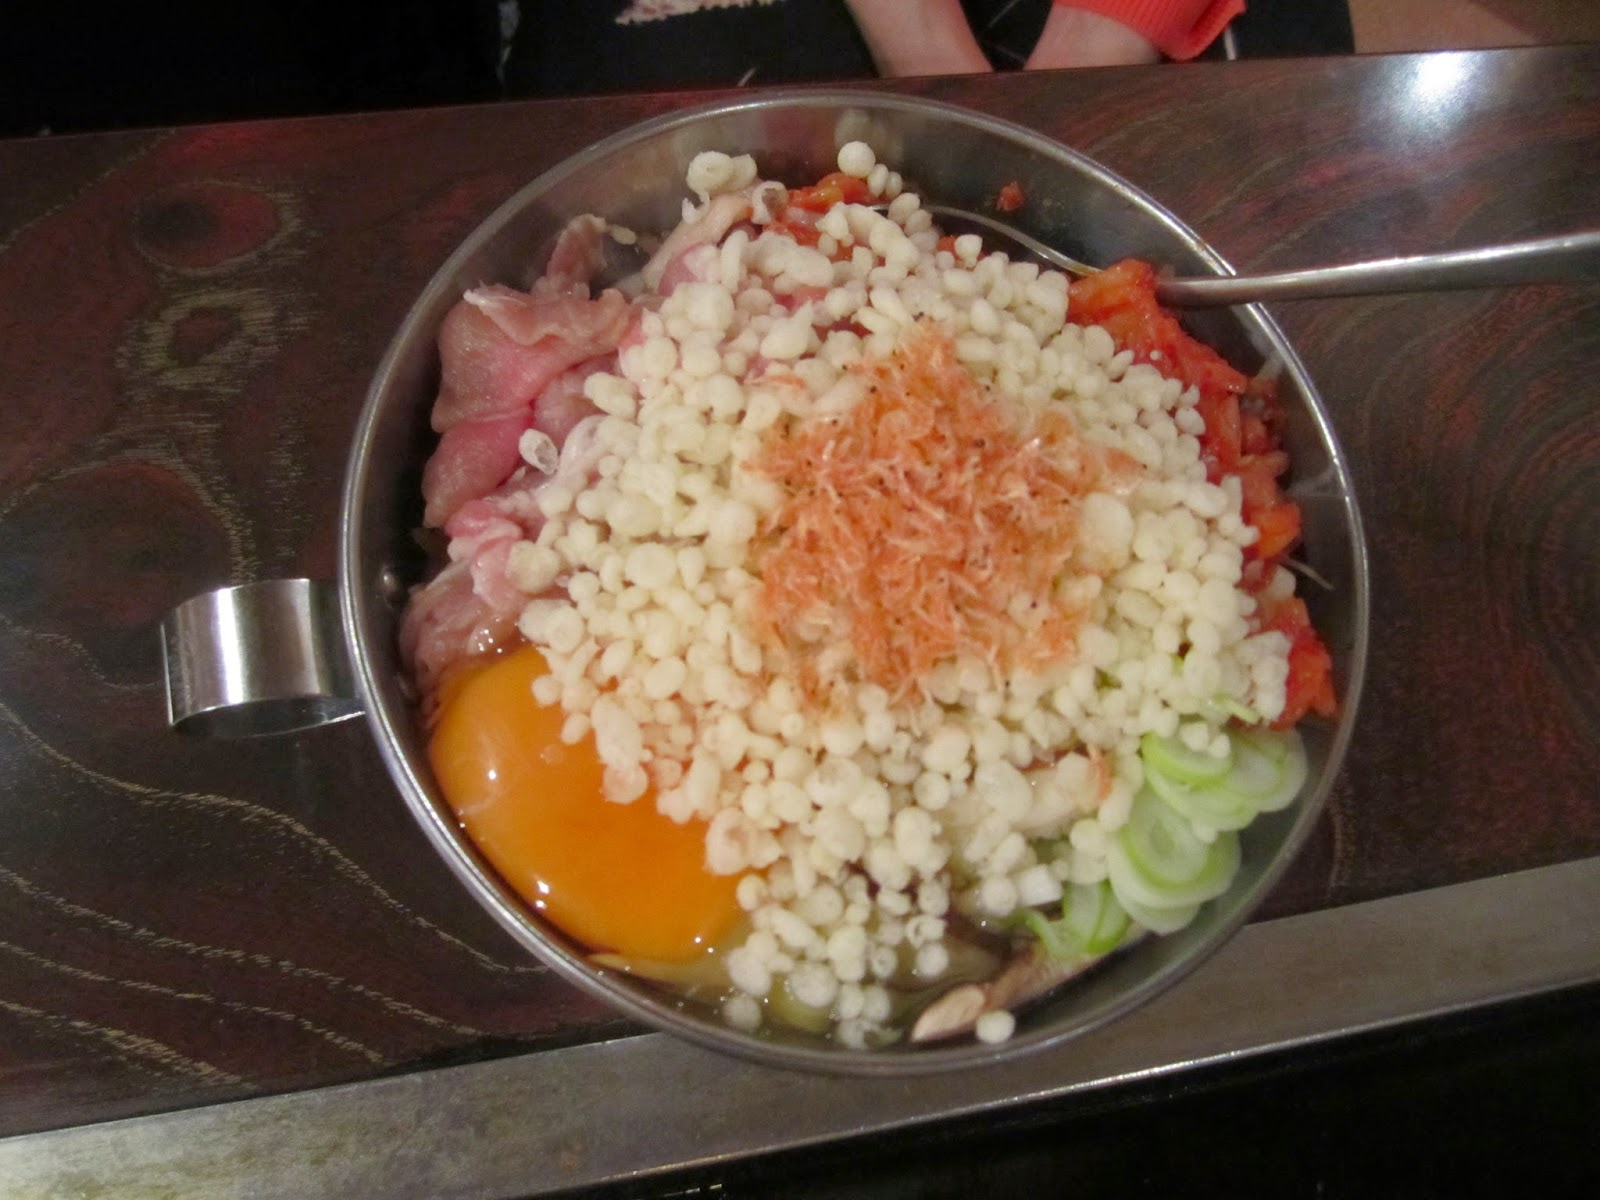 Pork Kimchi Ten Okonomiyaki Asakusa Towada 豚キムチ天 お好み焼き 浅草 十和田市